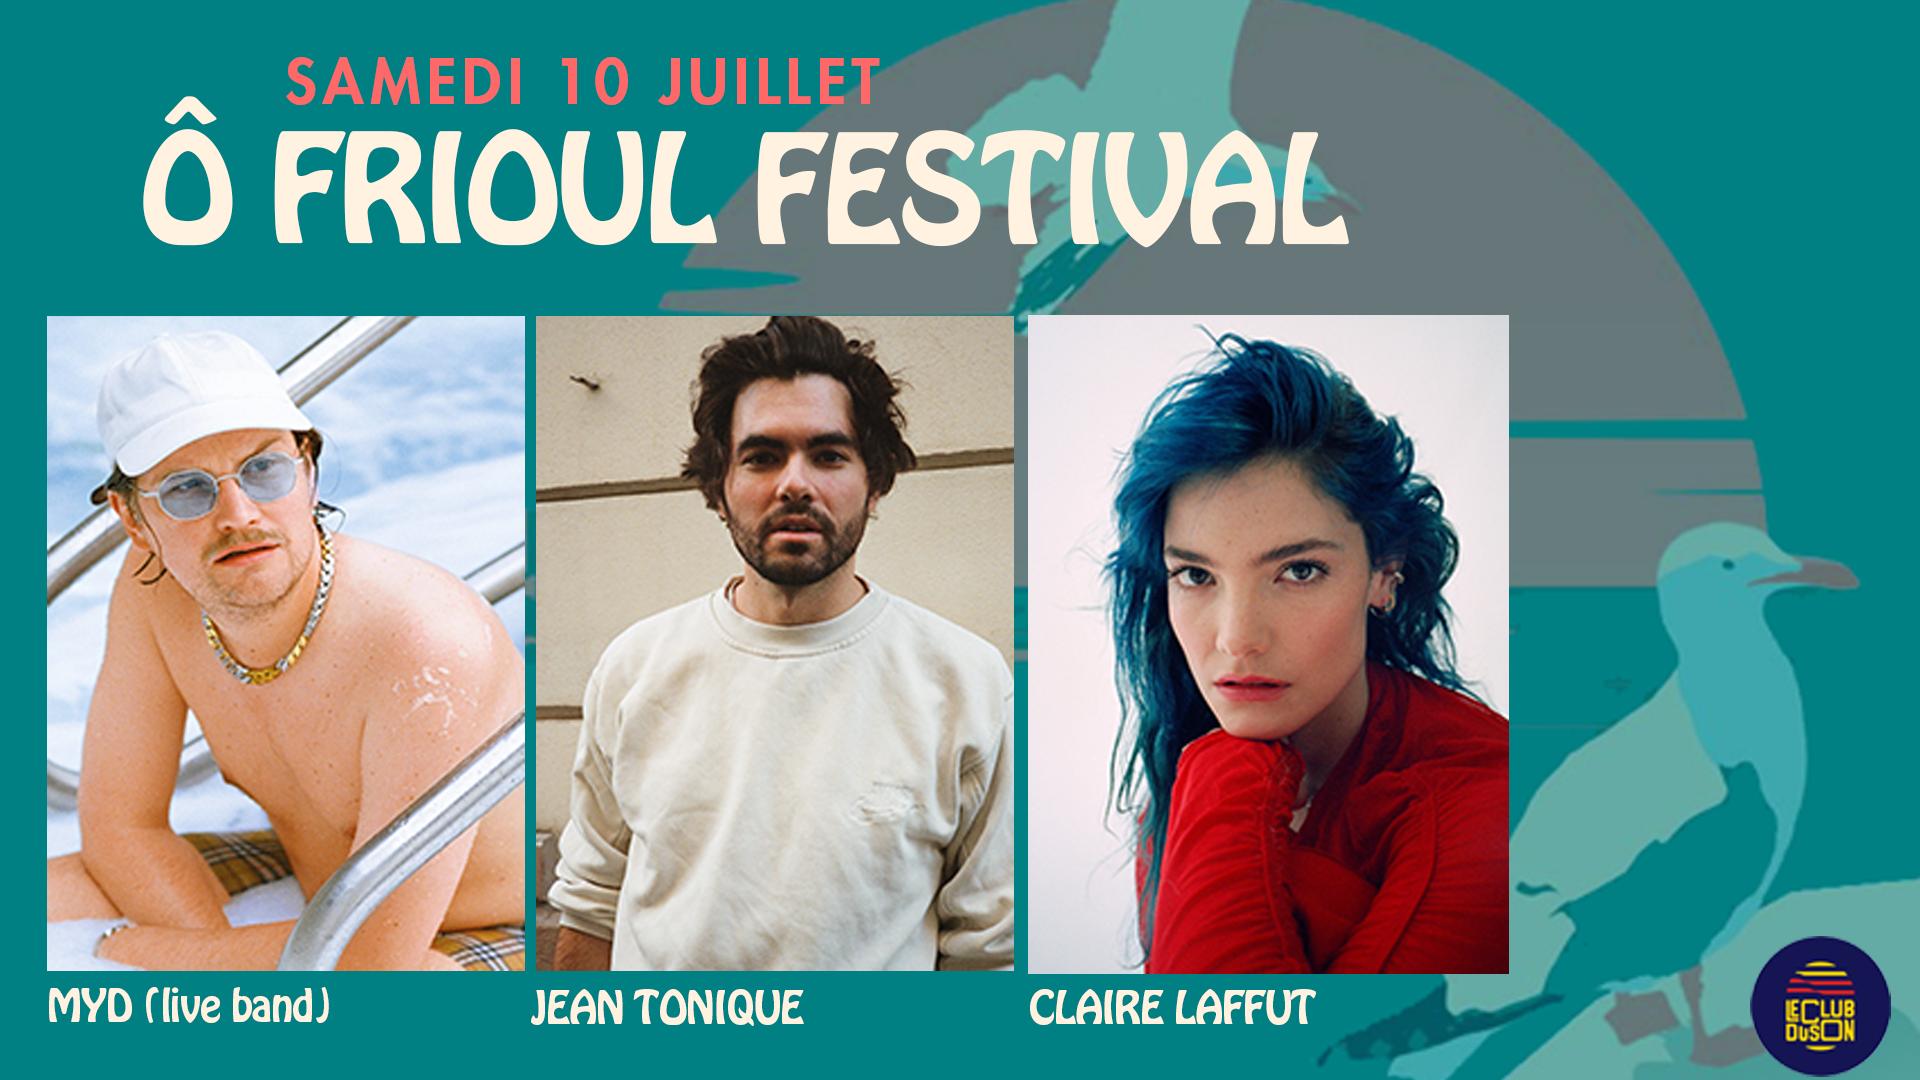 Ô Frioul Festival | Samedi